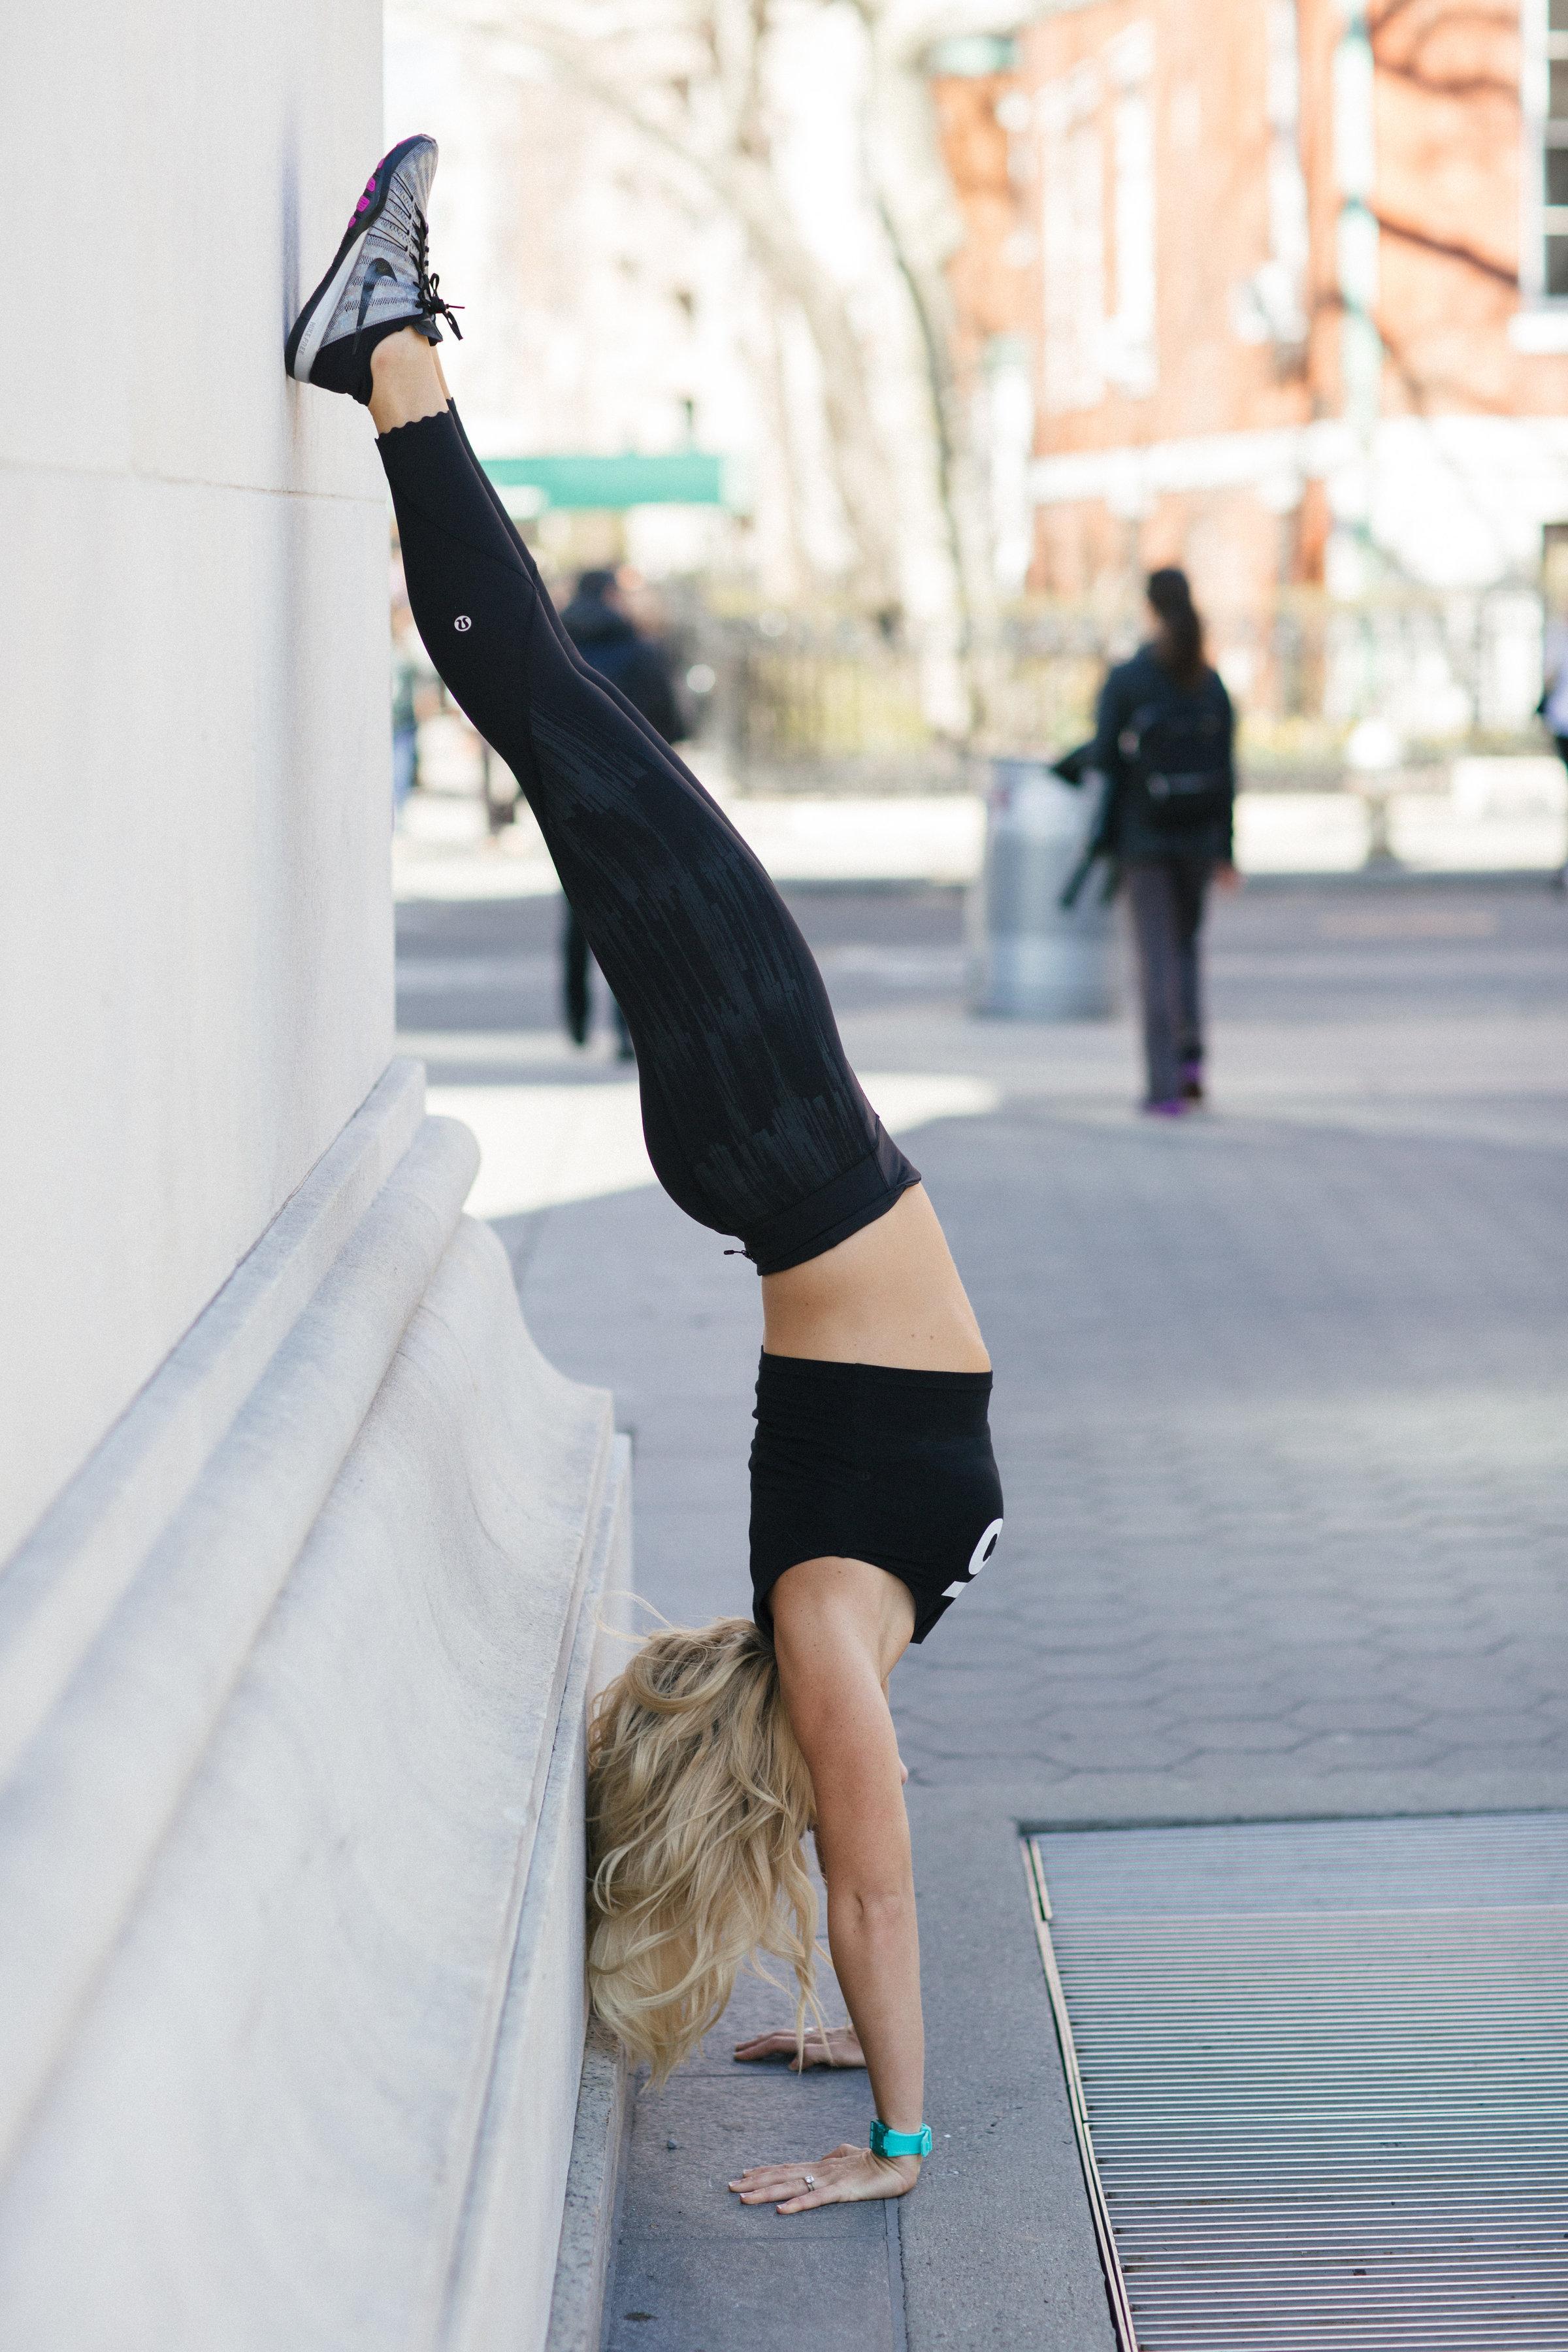 Anna Kooiman handstand washington square park side nye lydia hudgens